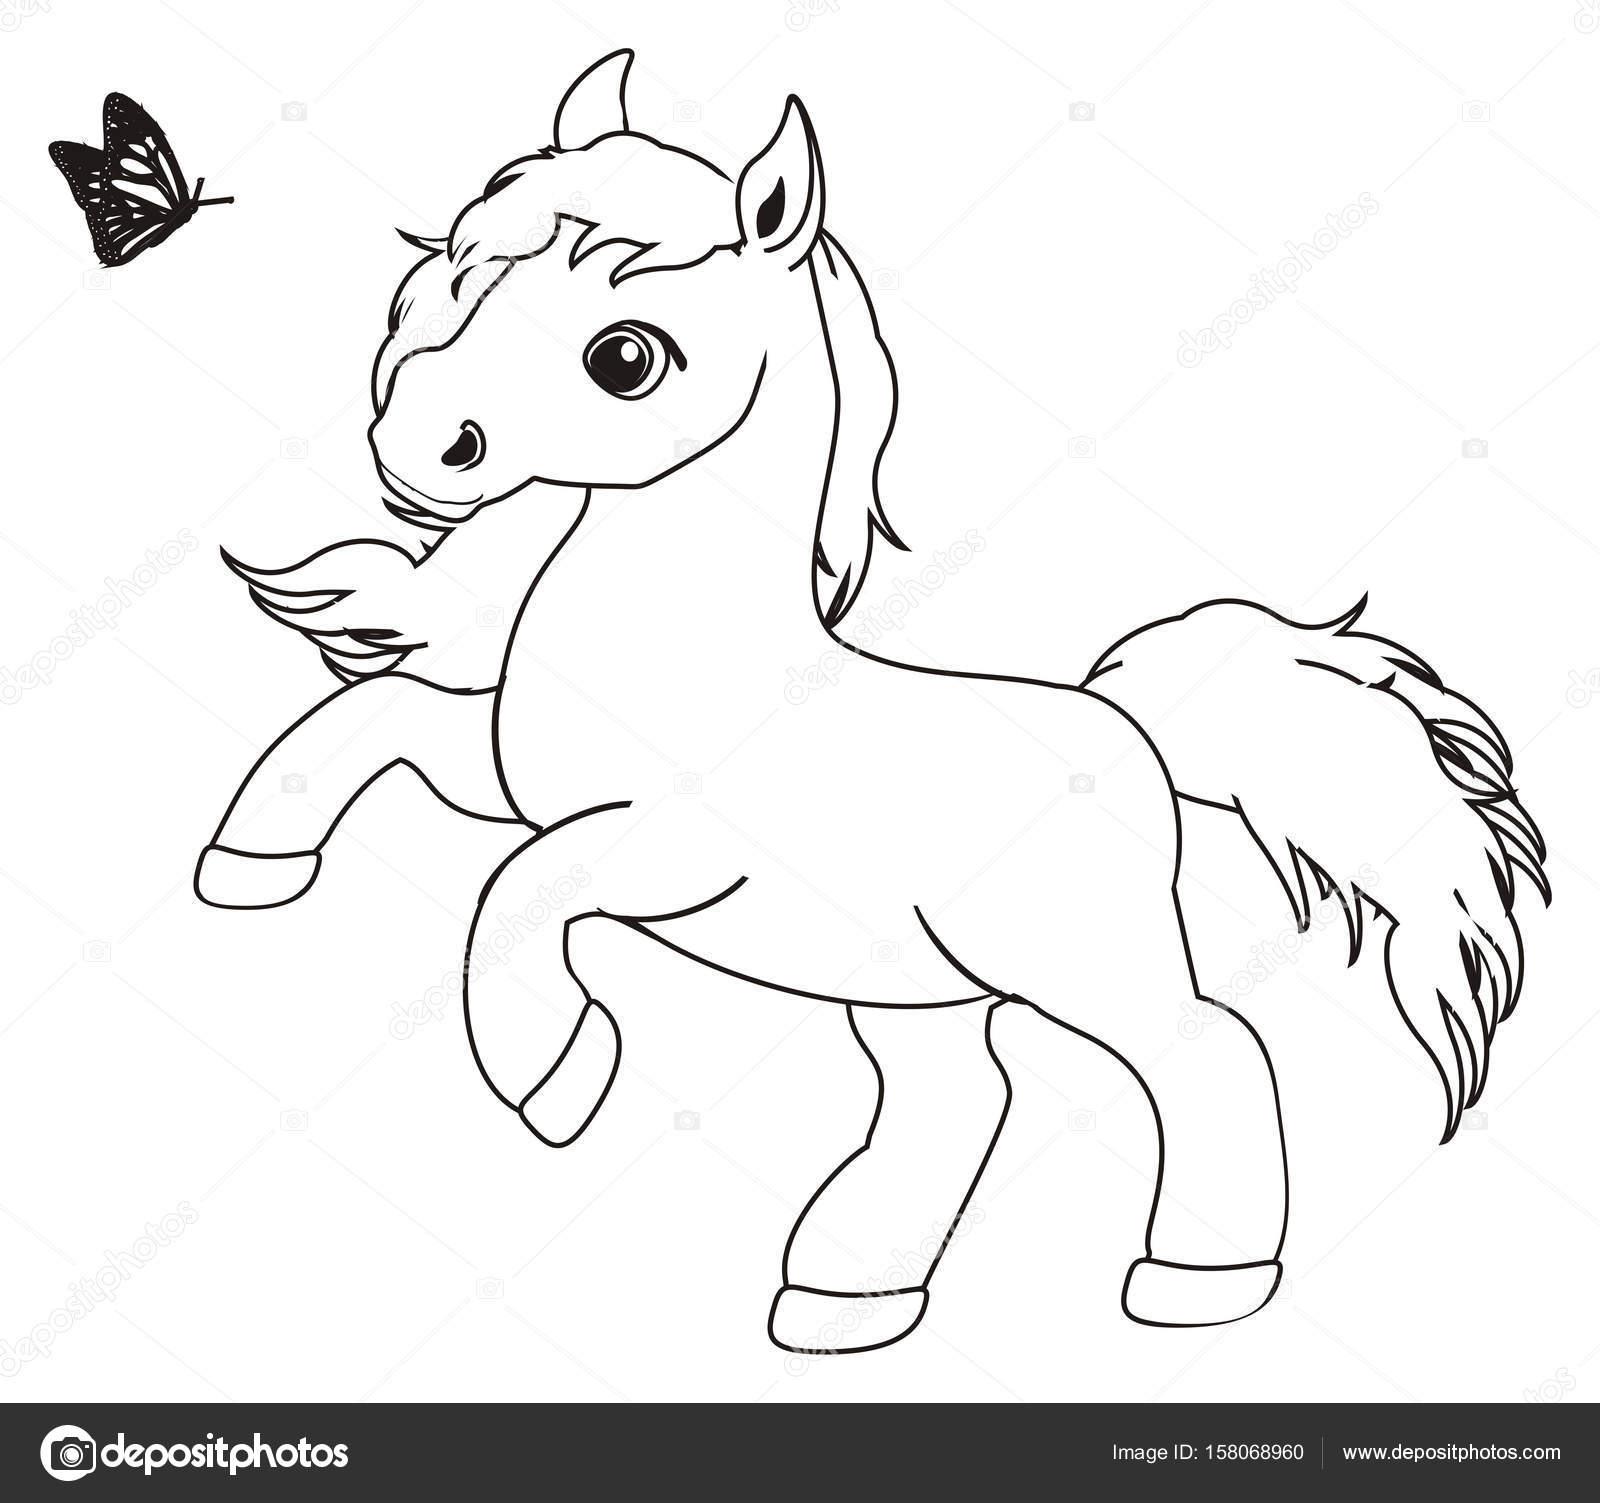 Kleurplaten Paarden En Dolfijnen.Kleine Schattige Paard Kleurplaat Stockfoto C Tatty77tatty 158068960